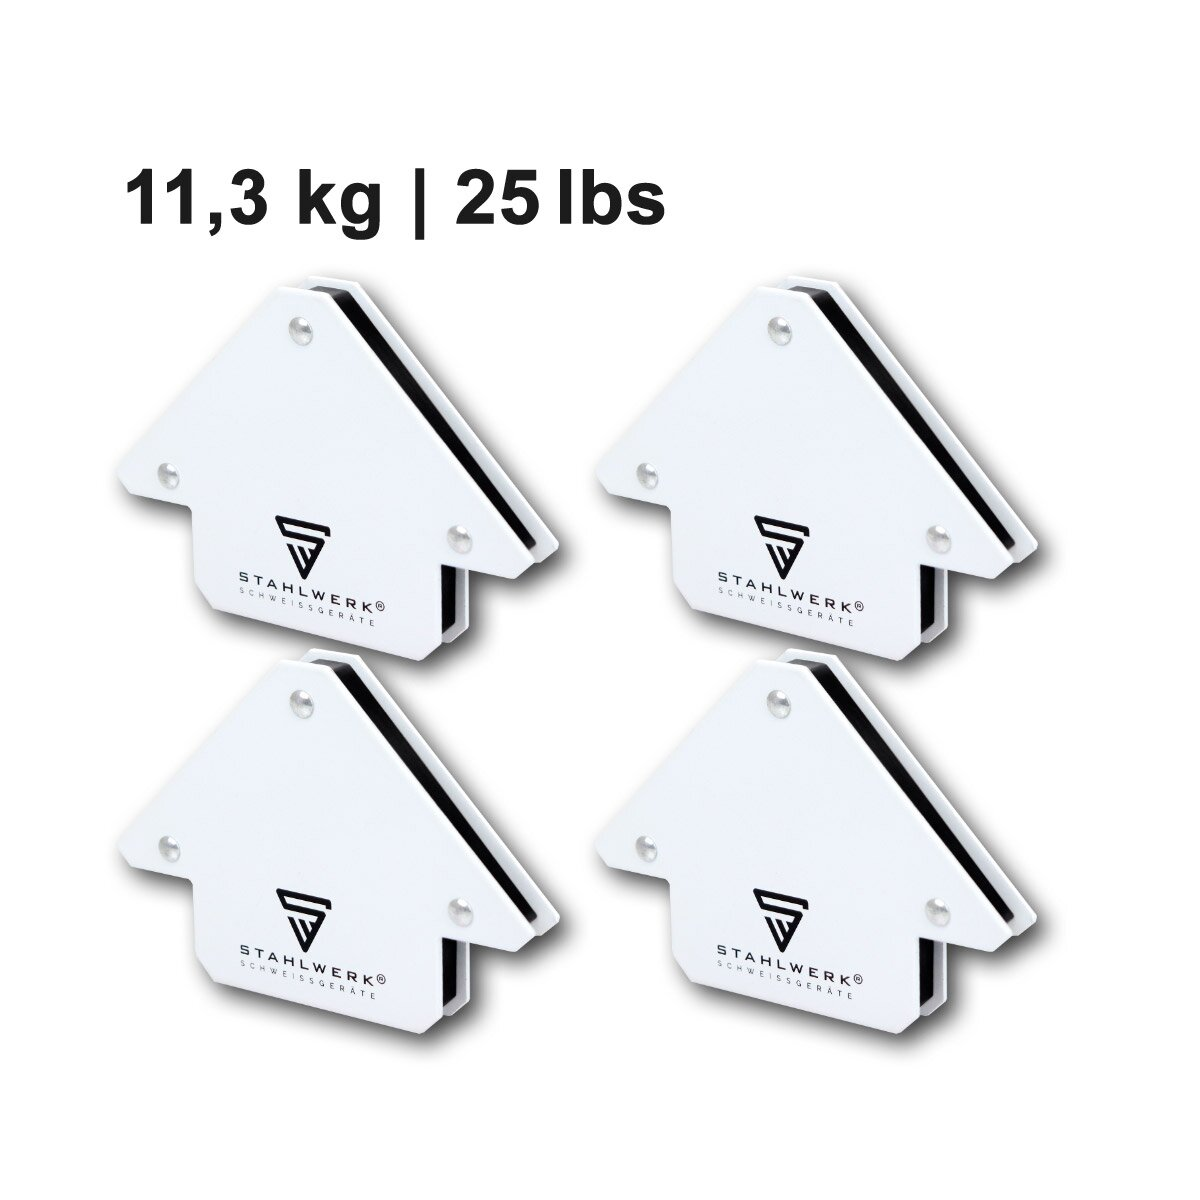 Haftkraft jeweils 9 lbs // 4 kg 45/° x 90/° x 135/° 4 /× STAHLWERK Magnetische Schwei/ßwinkel Magnetwinkel Schwei/ßmagnet Winkelmagnet wei/ß